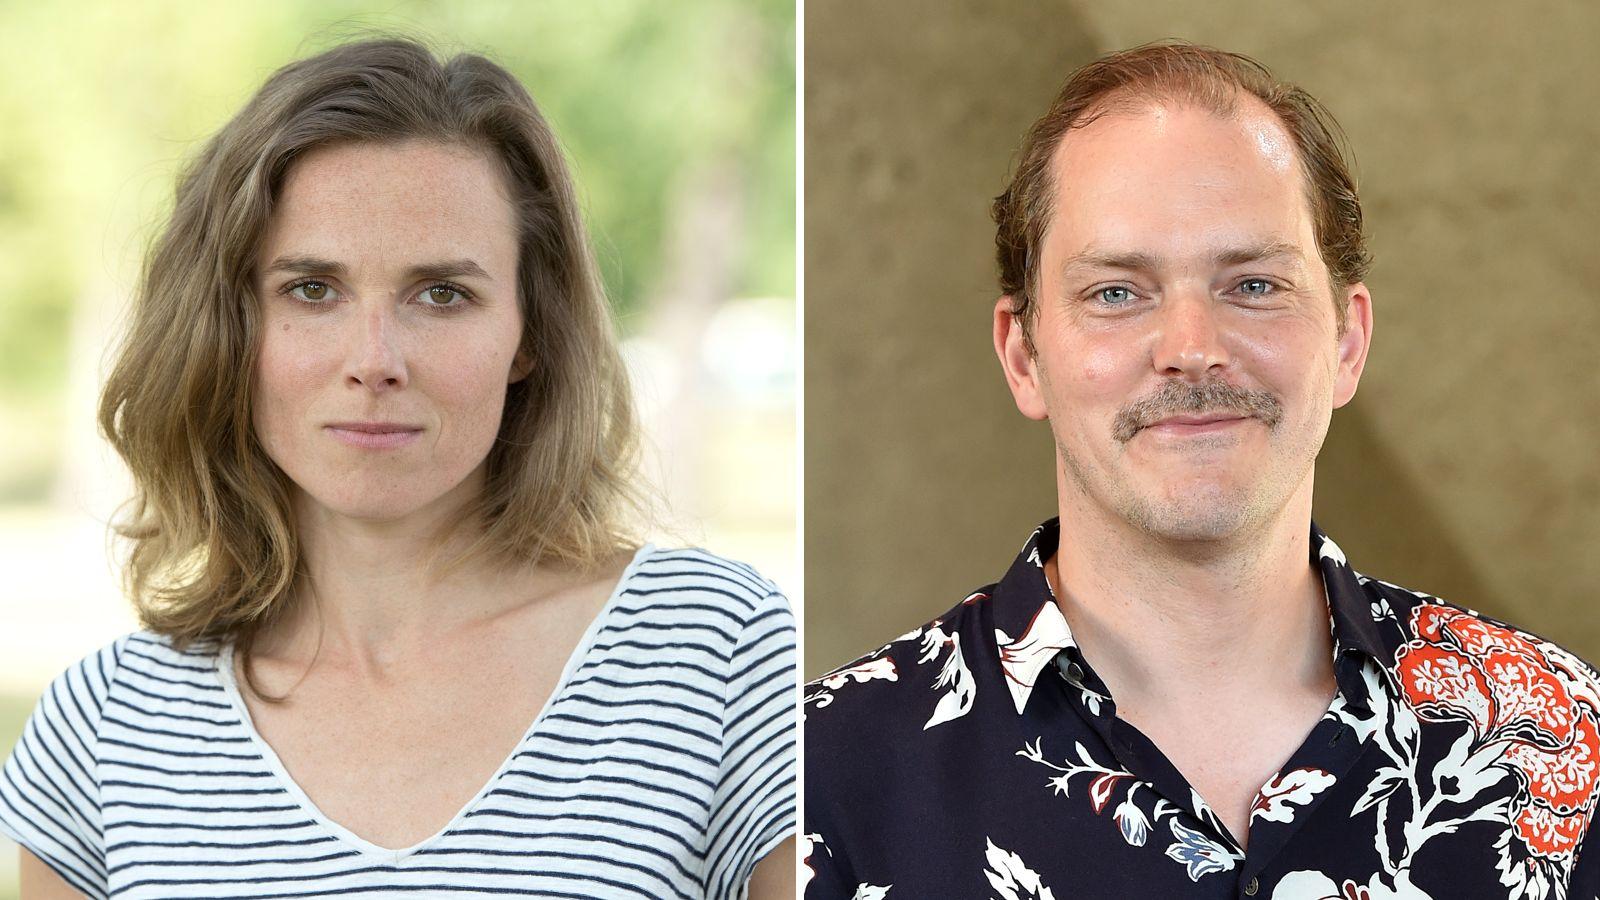 Actout/ Karin Hanczewski & Godehard Giese KOMBO